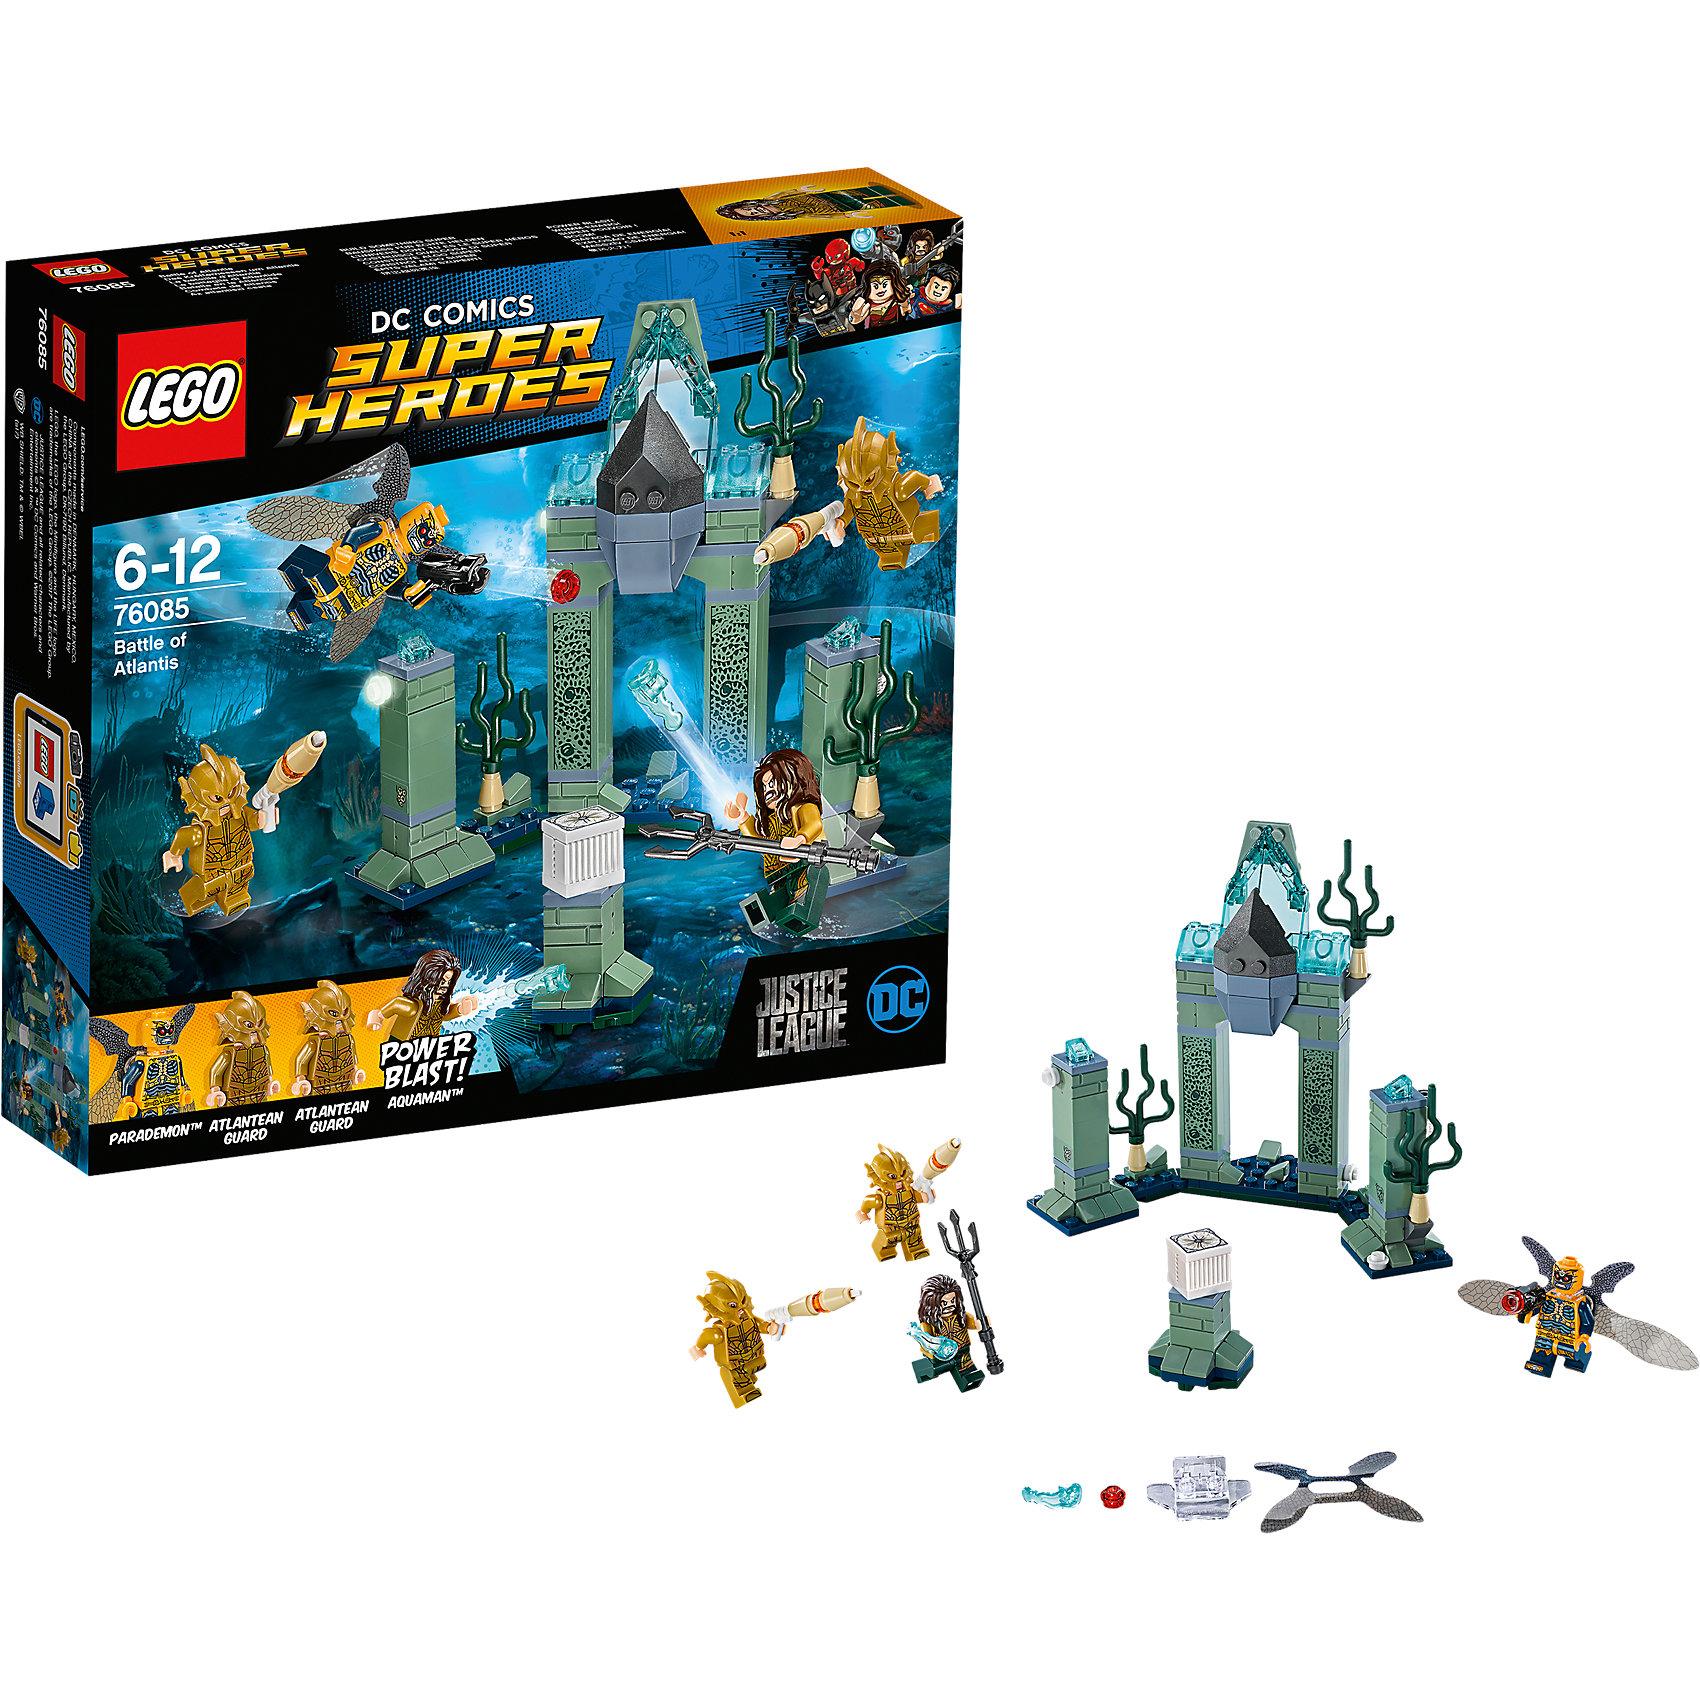 LEGO Super Heroes 76085: Битва за АтлантидуПластмассовые конструкторы<br><br><br>Ширина мм: 207<br>Глубина мм: 192<br>Высота мм: 48<br>Вес г: 263<br>Возраст от месяцев: 72<br>Возраст до месяцев: 144<br>Пол: Мужской<br>Возраст: Детский<br>SKU: 5620016